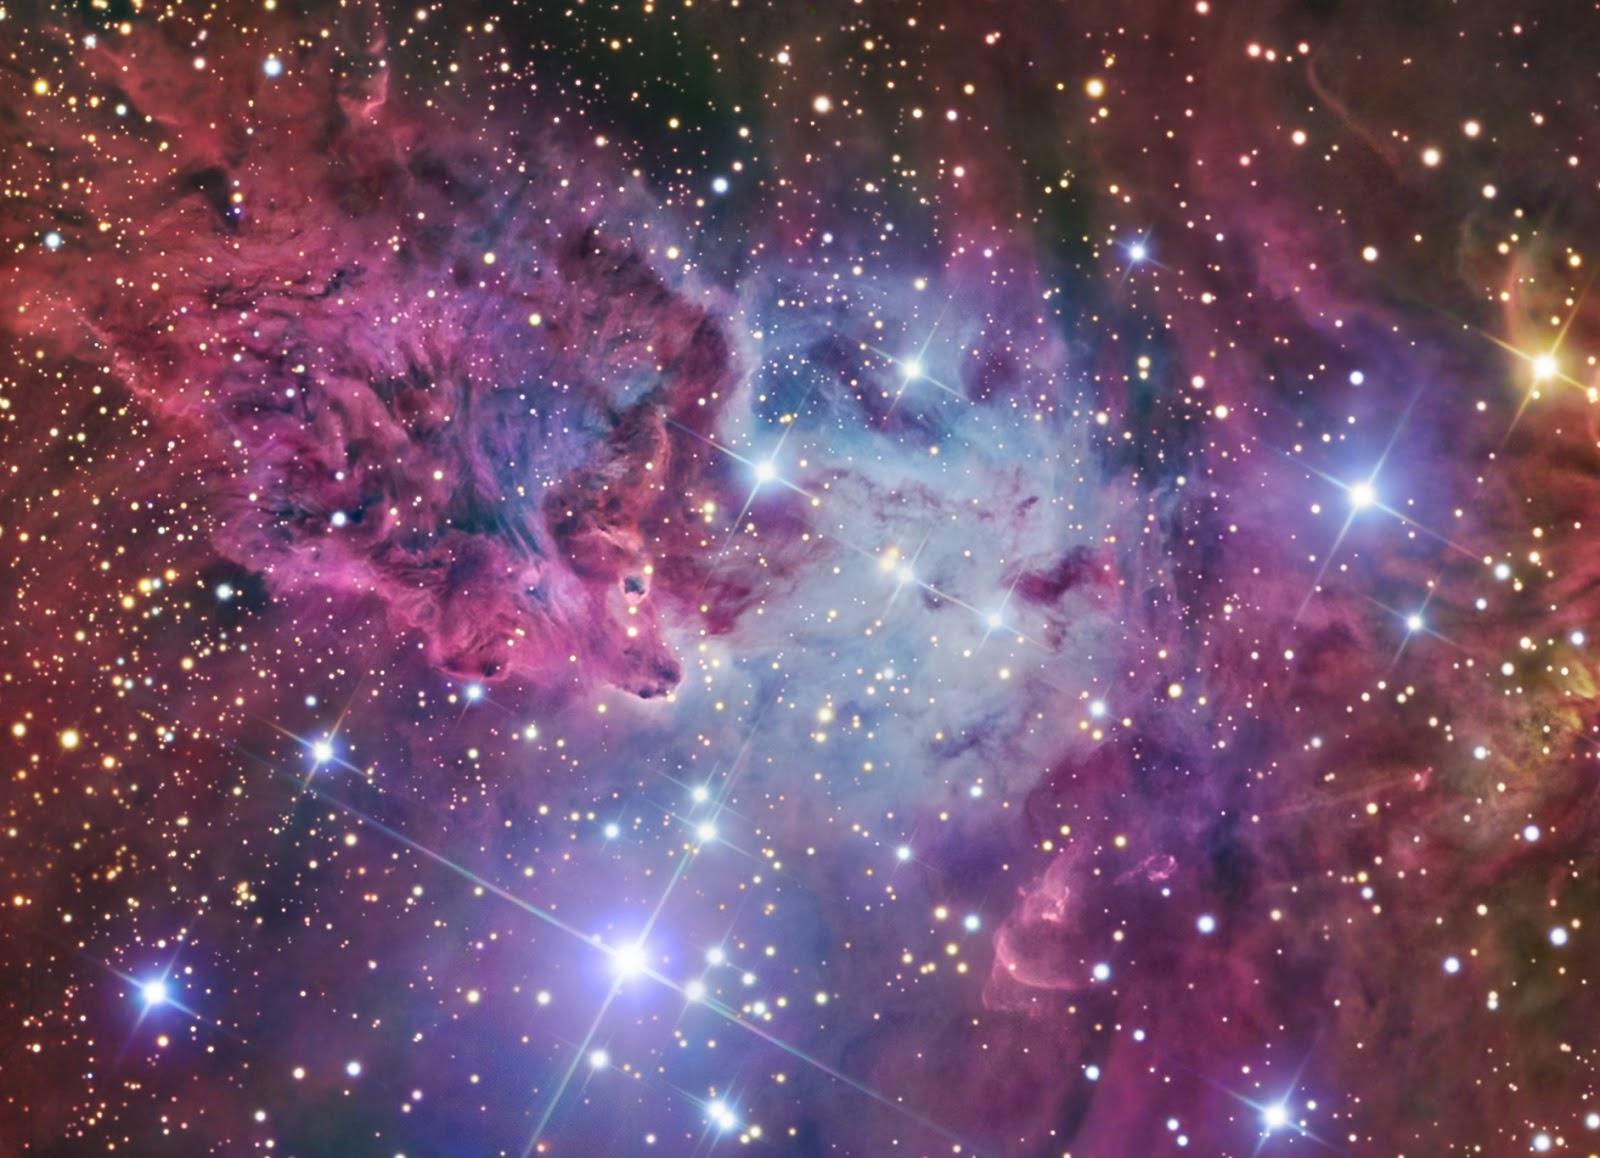 http://www.cosmotography.com/images/lrg_Fox_Fur_Nebula_crop_ngc2264.html